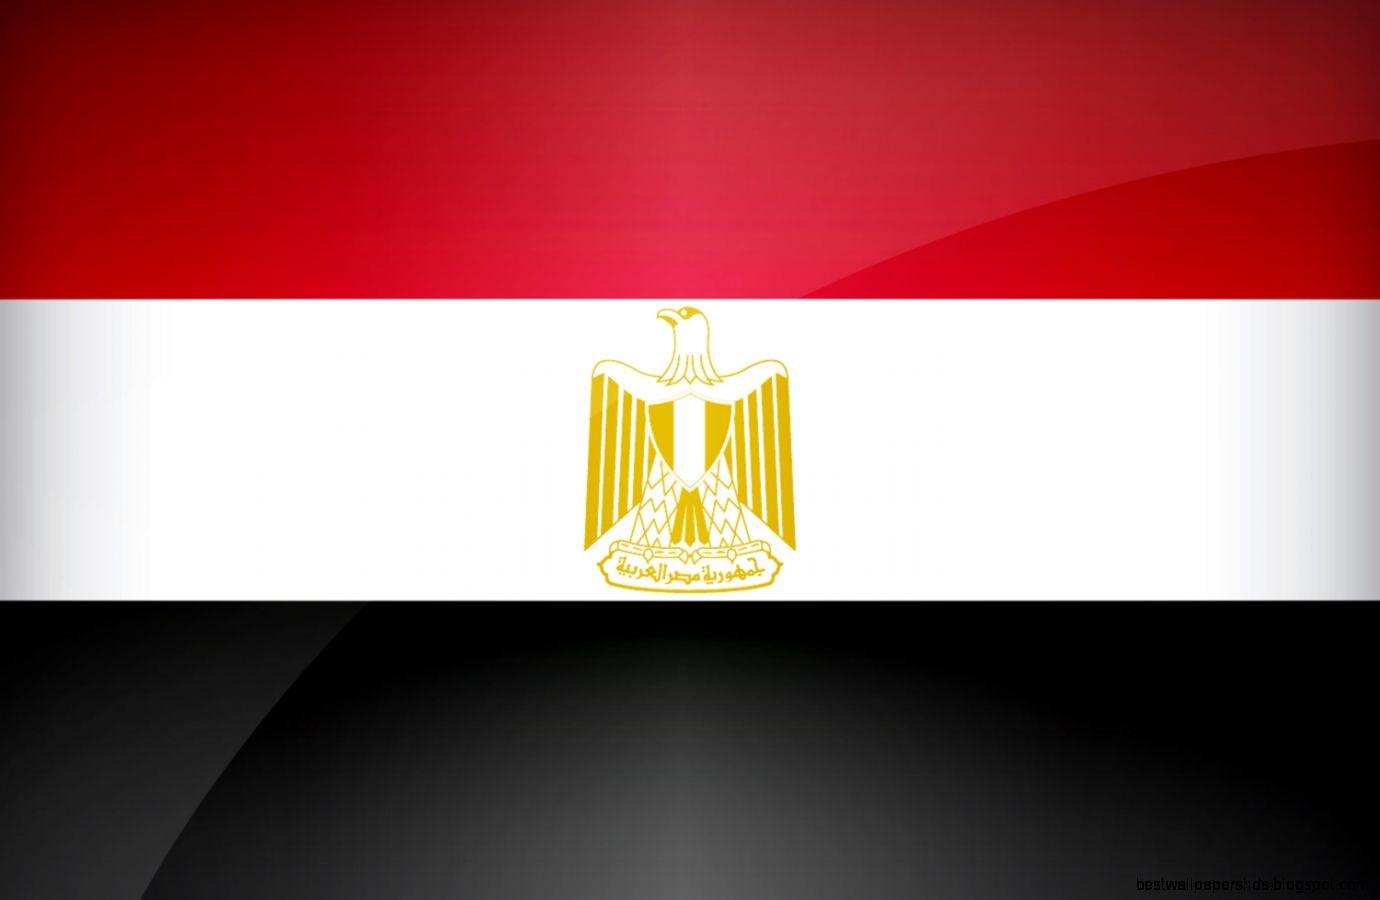 صور علم مصر hd (2)